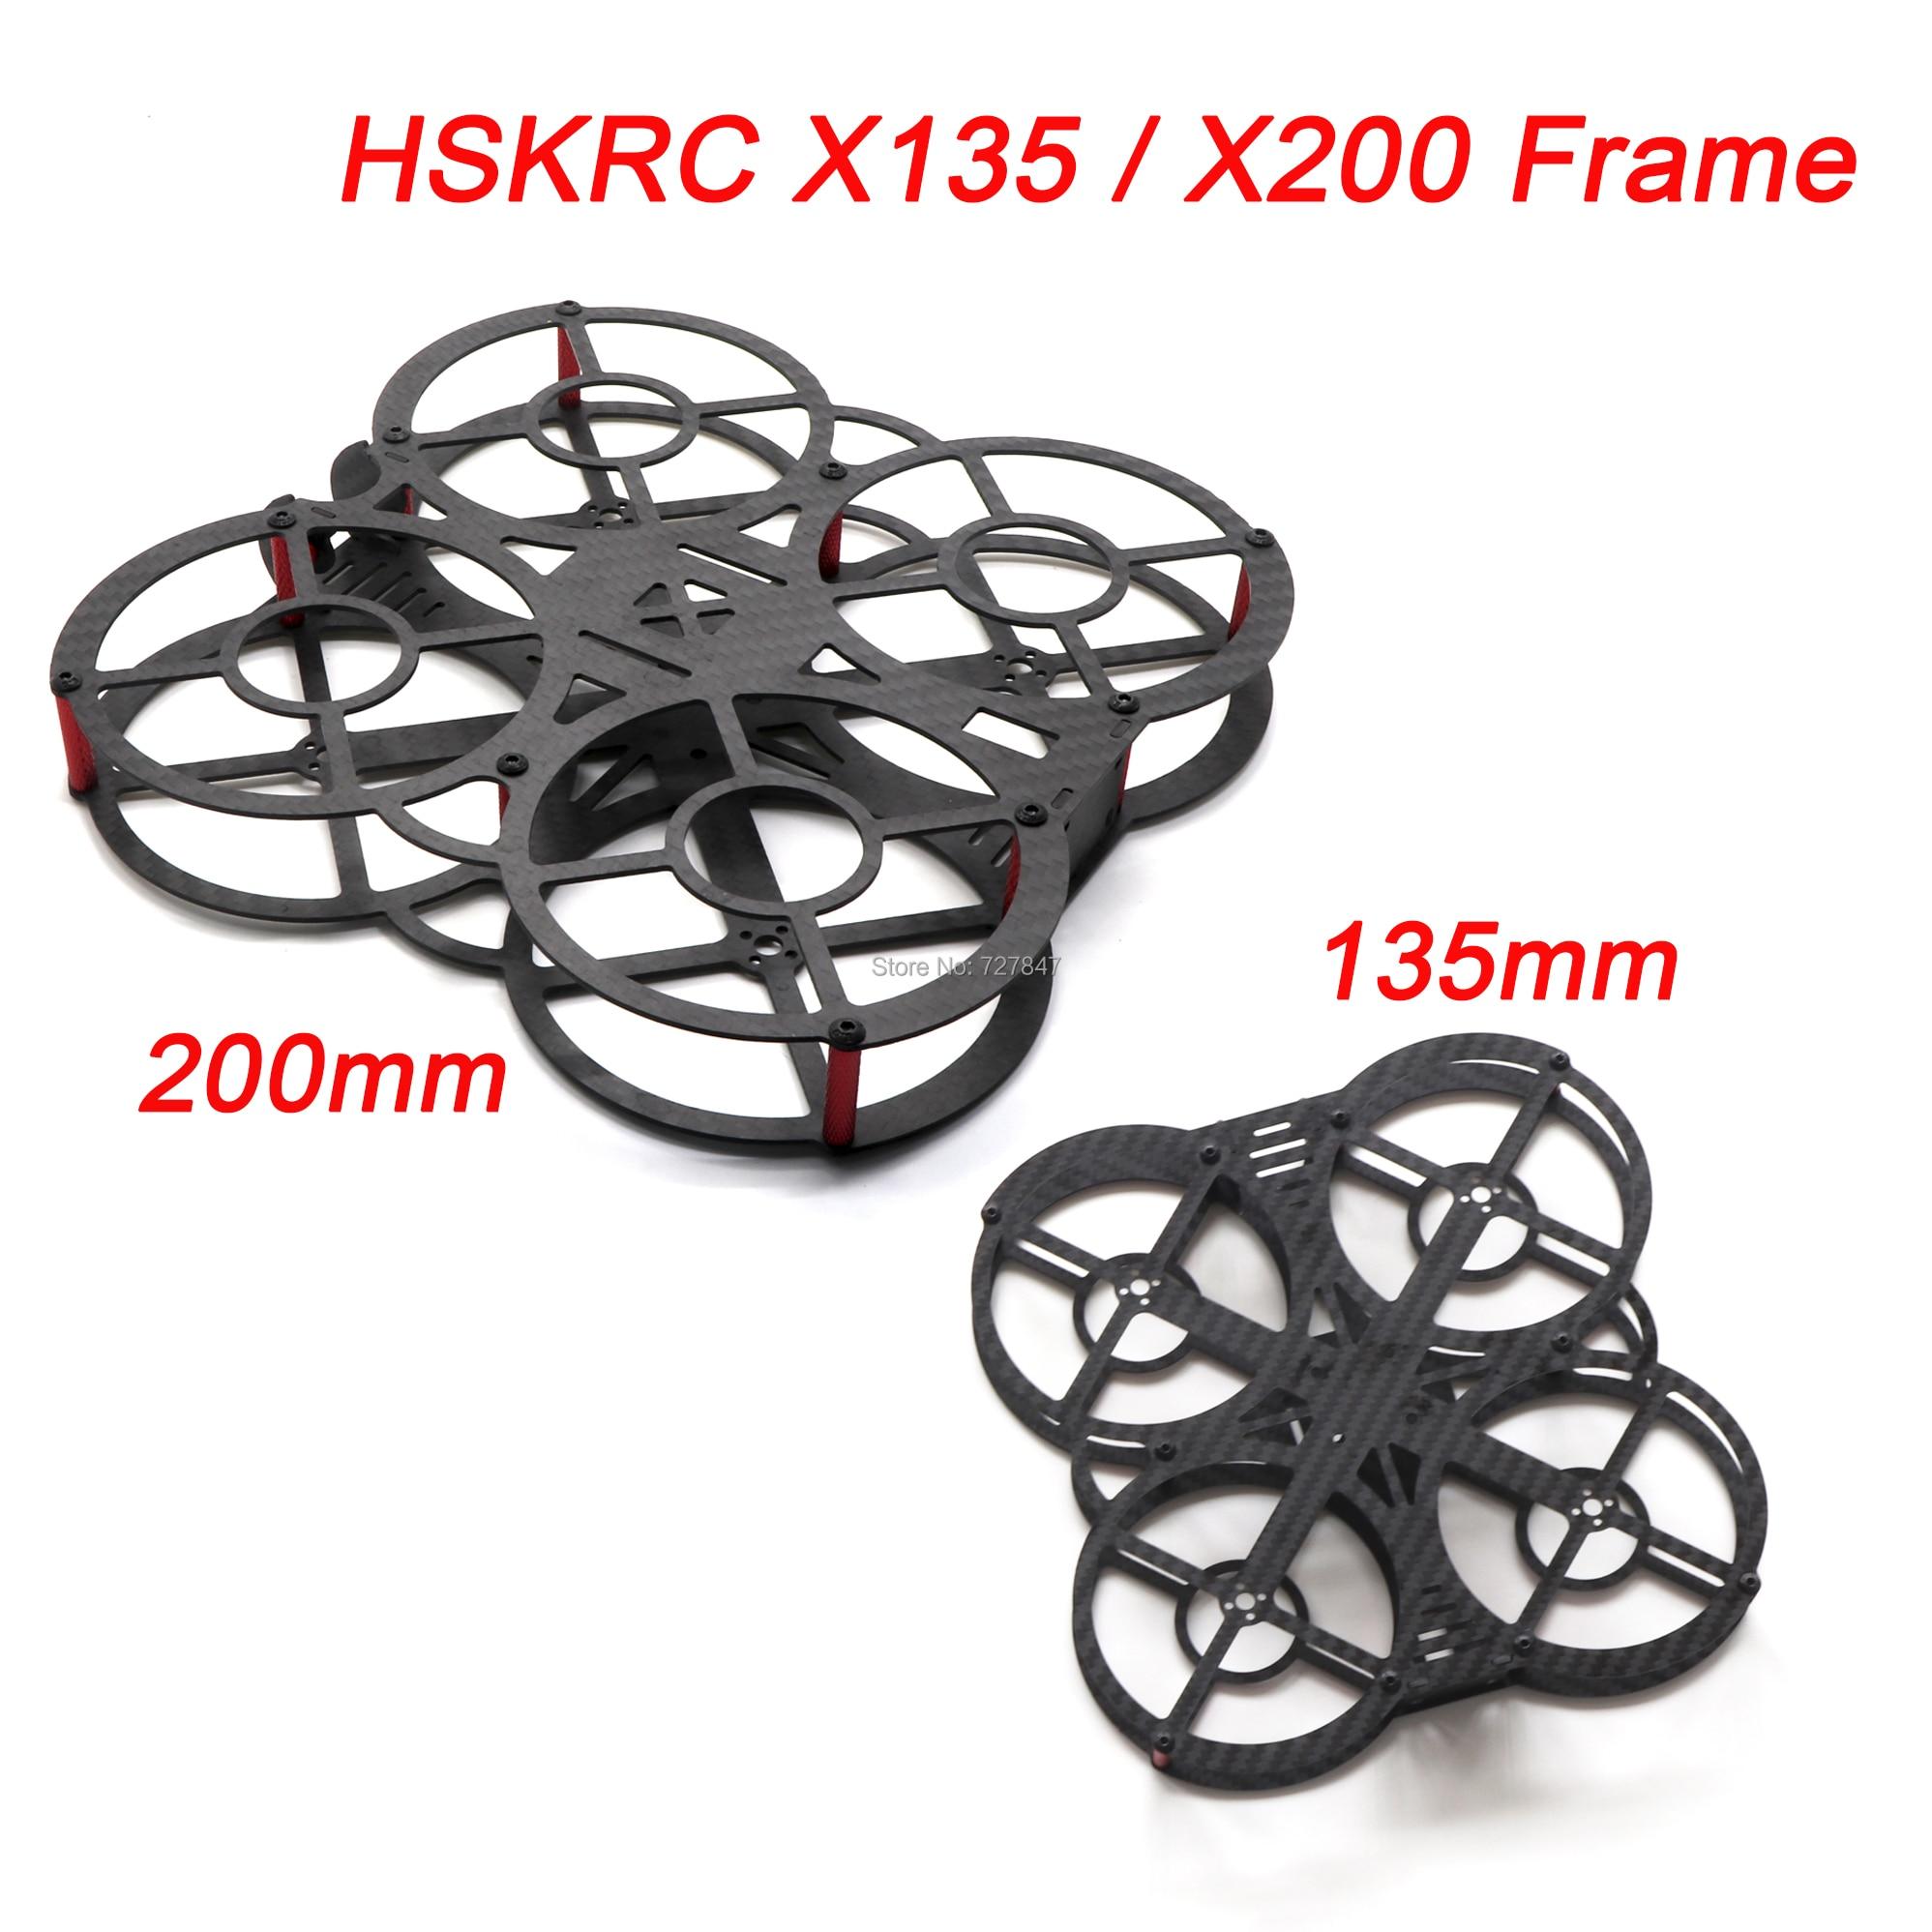 HSKRC FPV Mini 3inch X135 135mm / 5inch X200 200mm Carbon Fiber Quadcopter Frame for Mini RC Drone Quadcopter